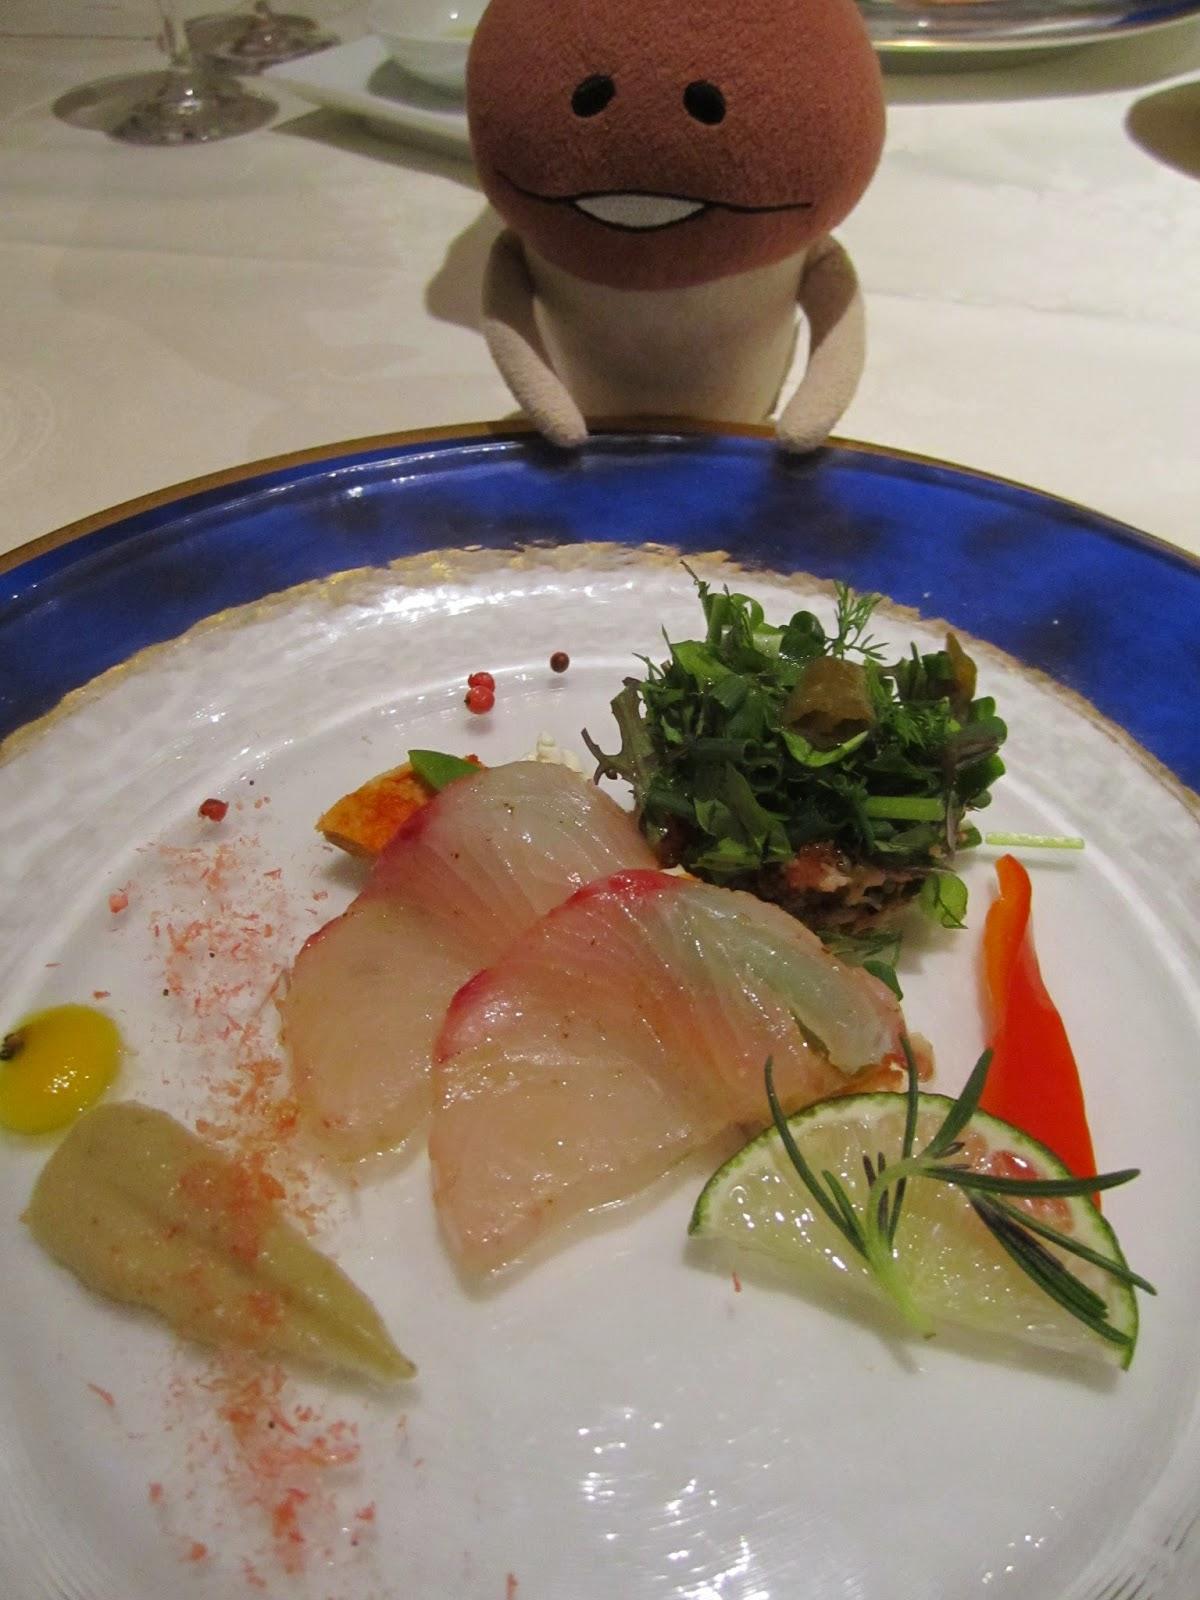 Hotel Neuschloss Otaru Blau Kuste buri  (Japanese amberjack, yellowtail) carpaccio with eggplant sauce, and a snowcrab crabcake